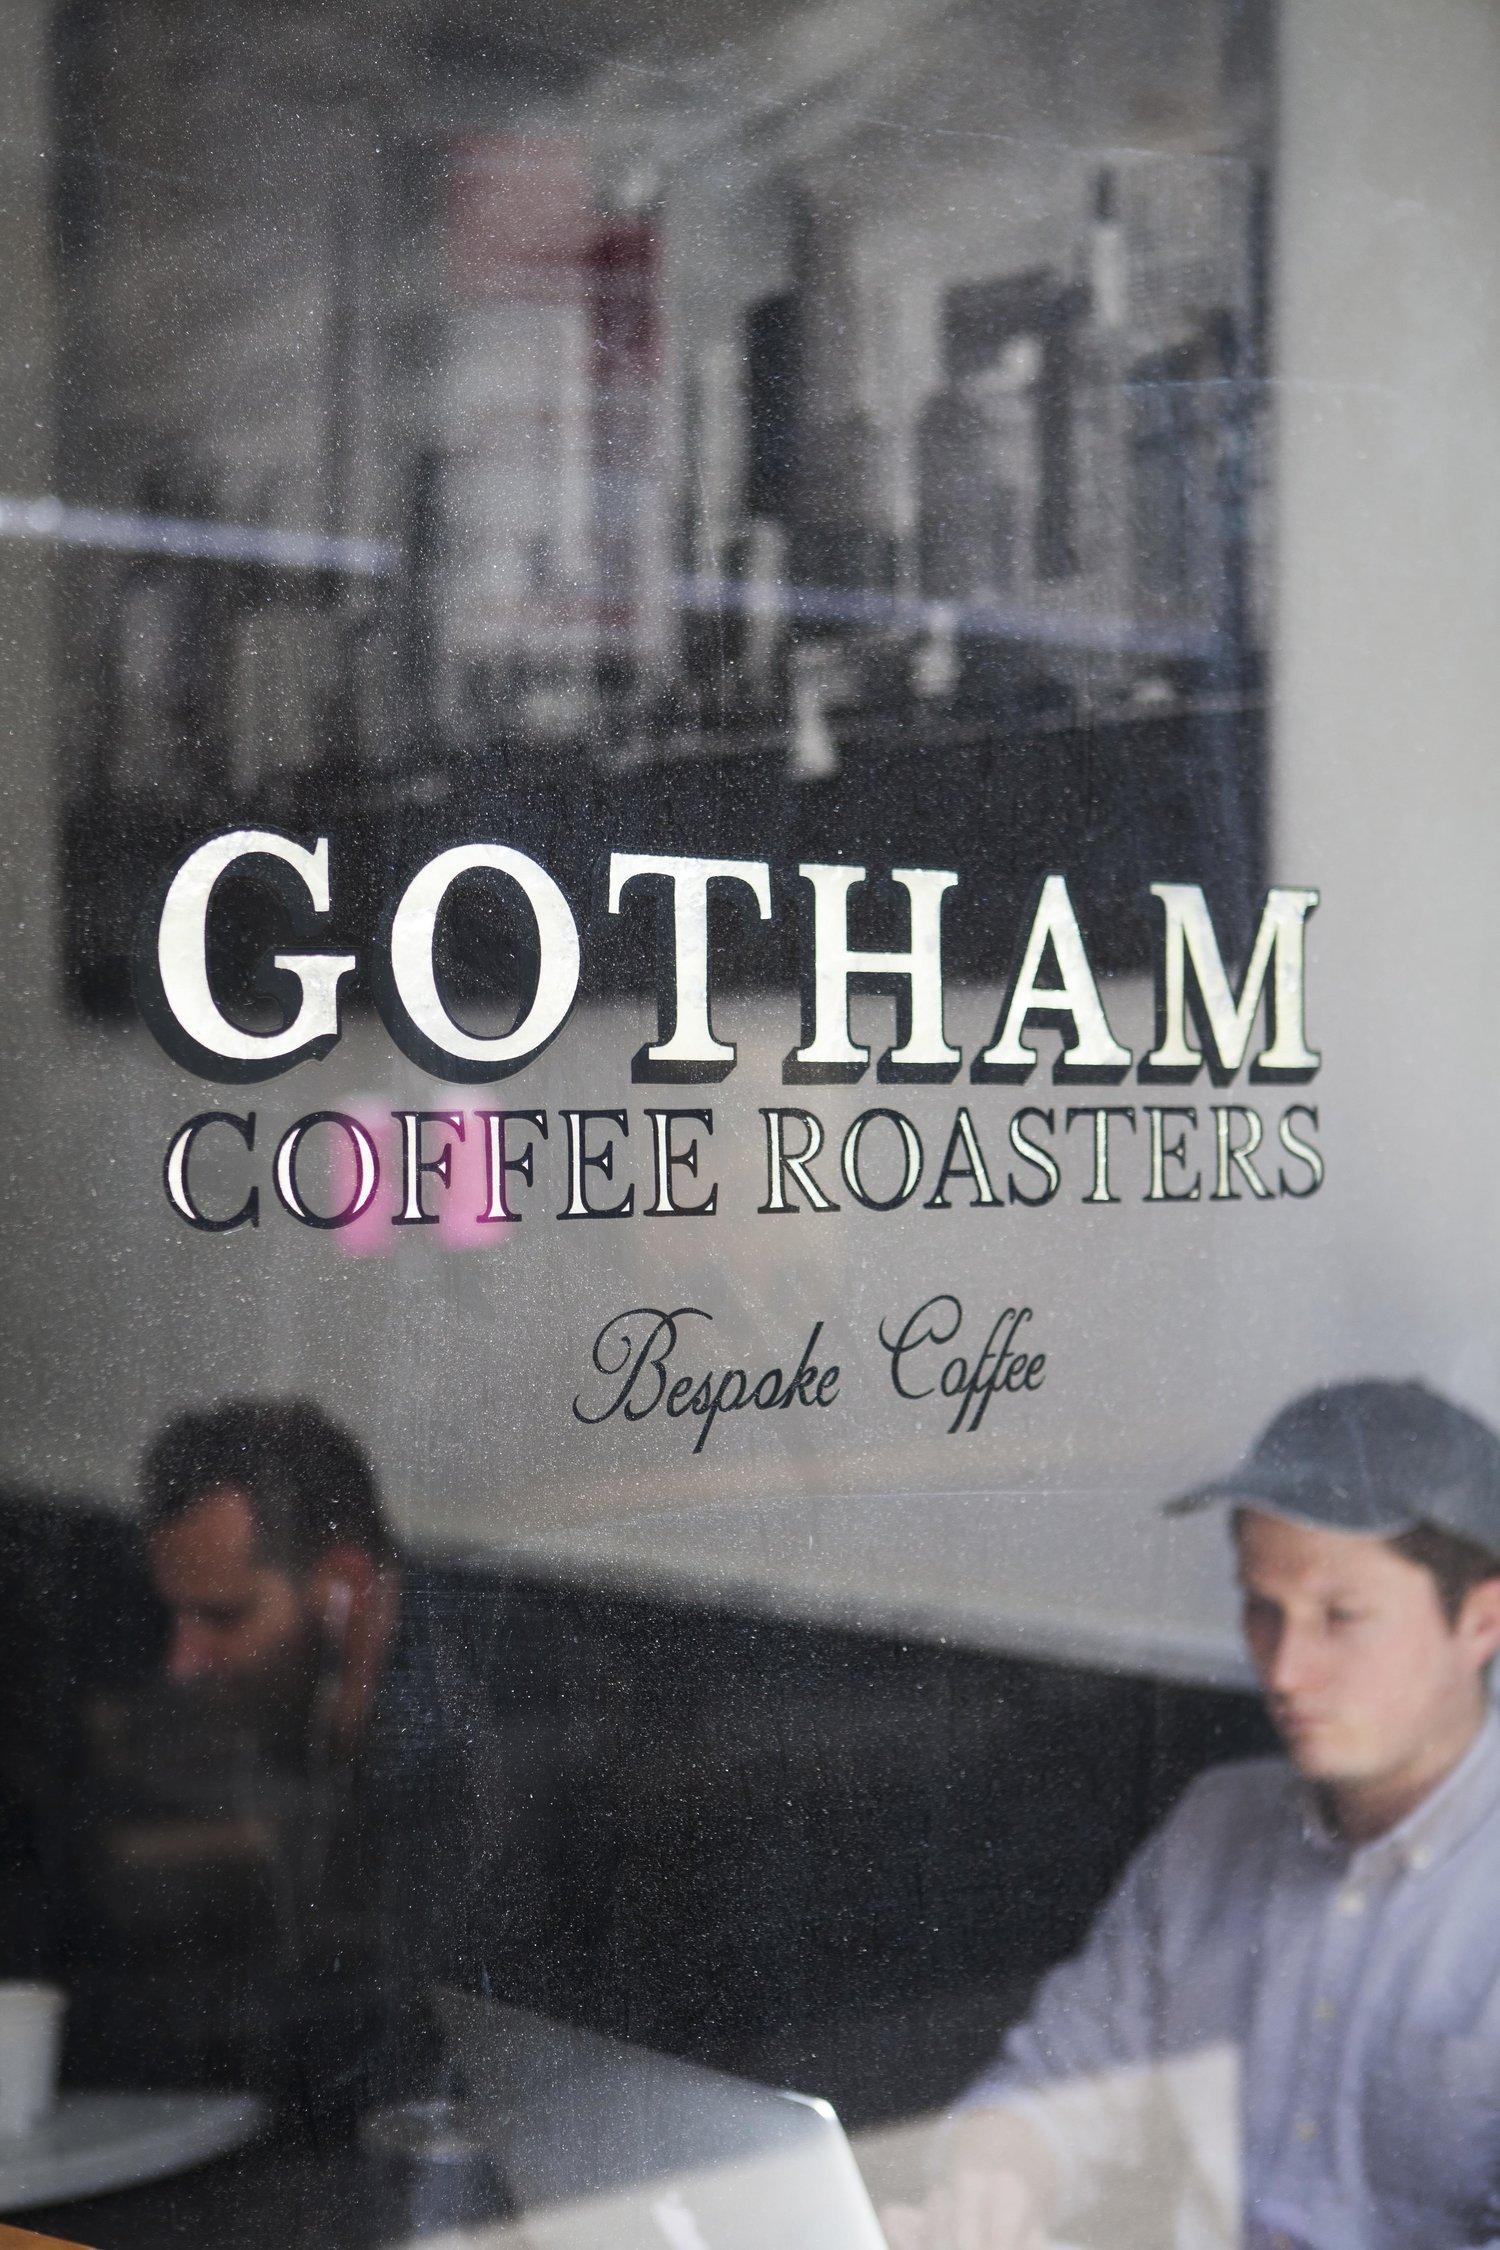 PHOTOS via Gotham Coffee Roasters/Chris Calkins